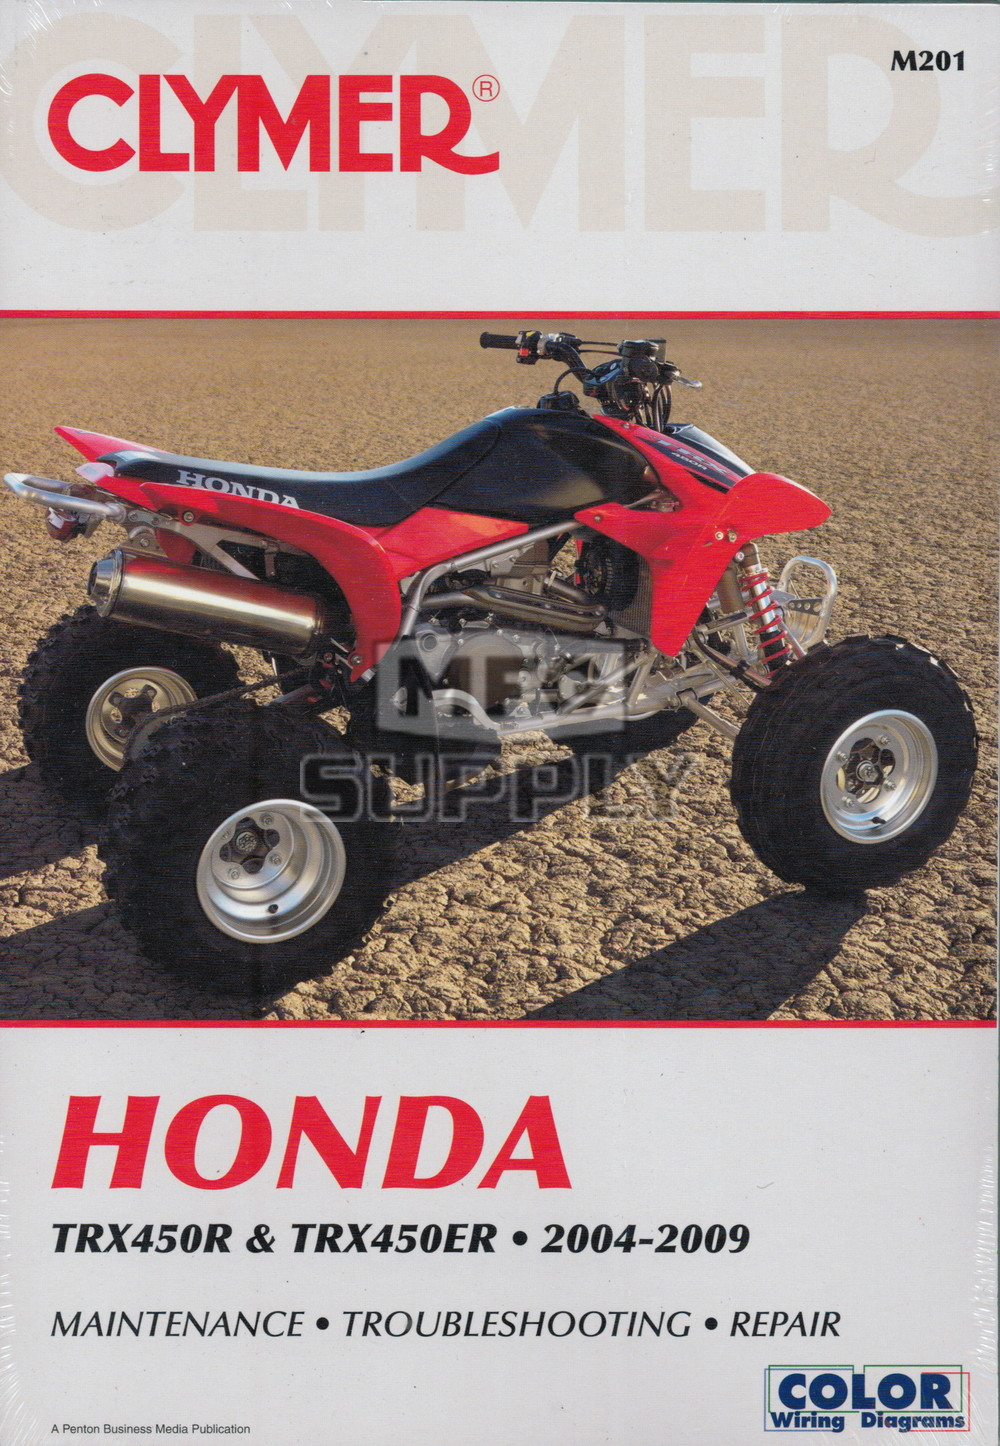 medium resolution of cm201 04 09 honda trx450r trx450er repair maintenance manual